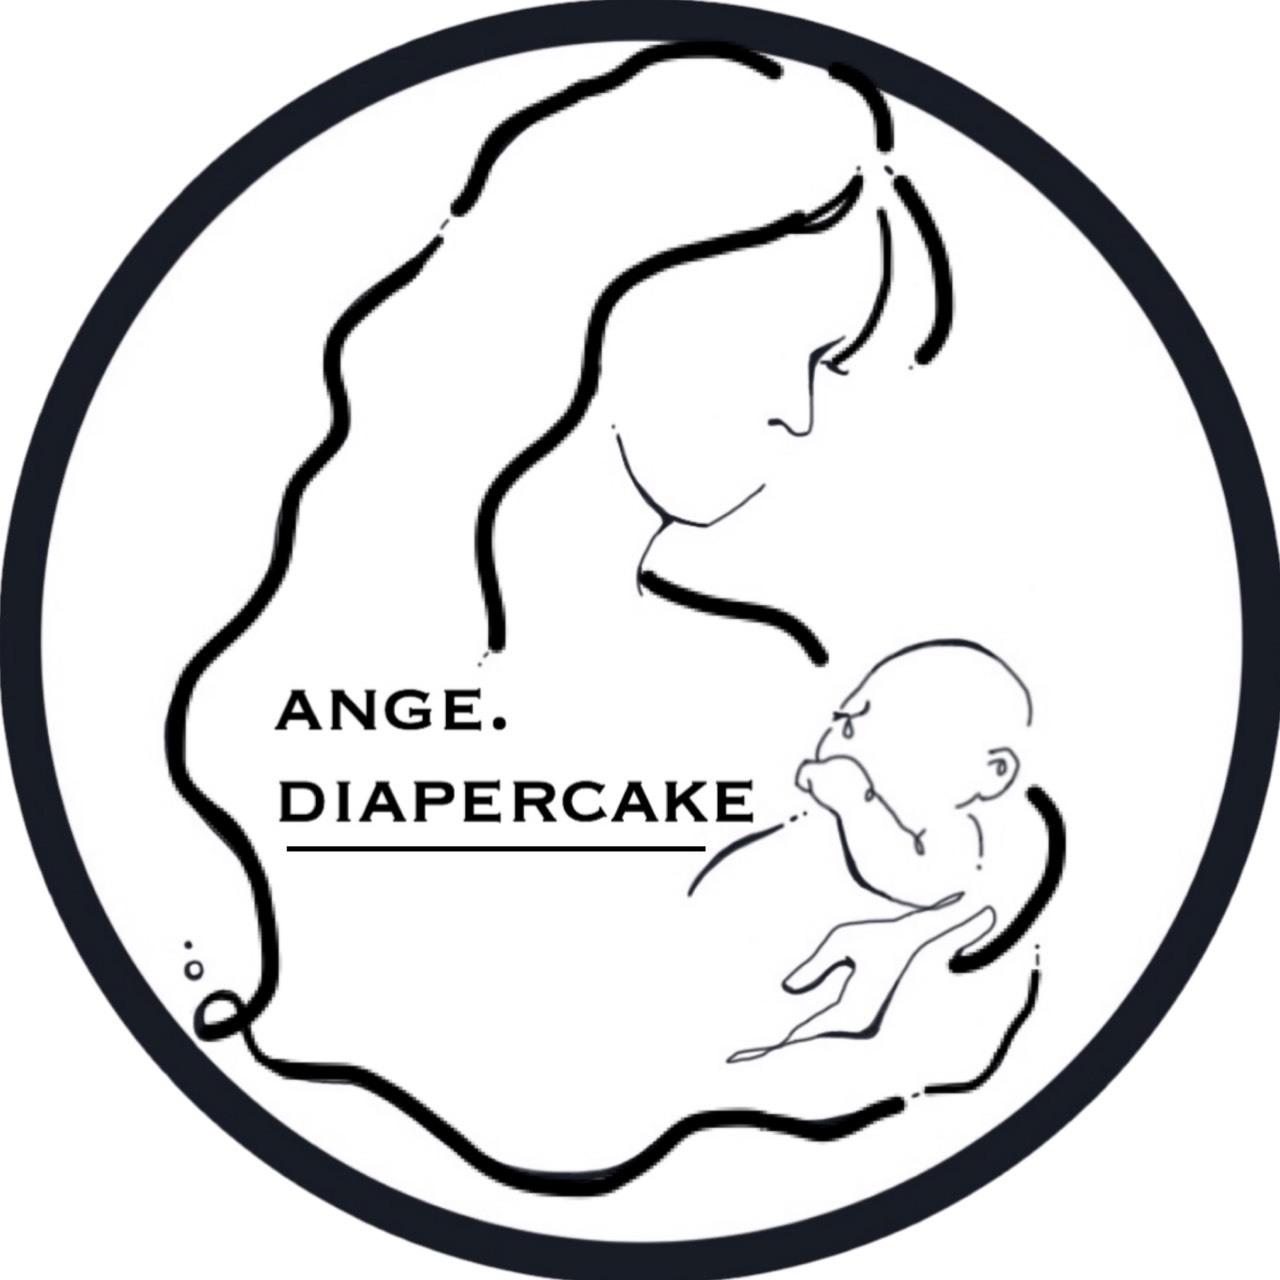 ange.diapercake